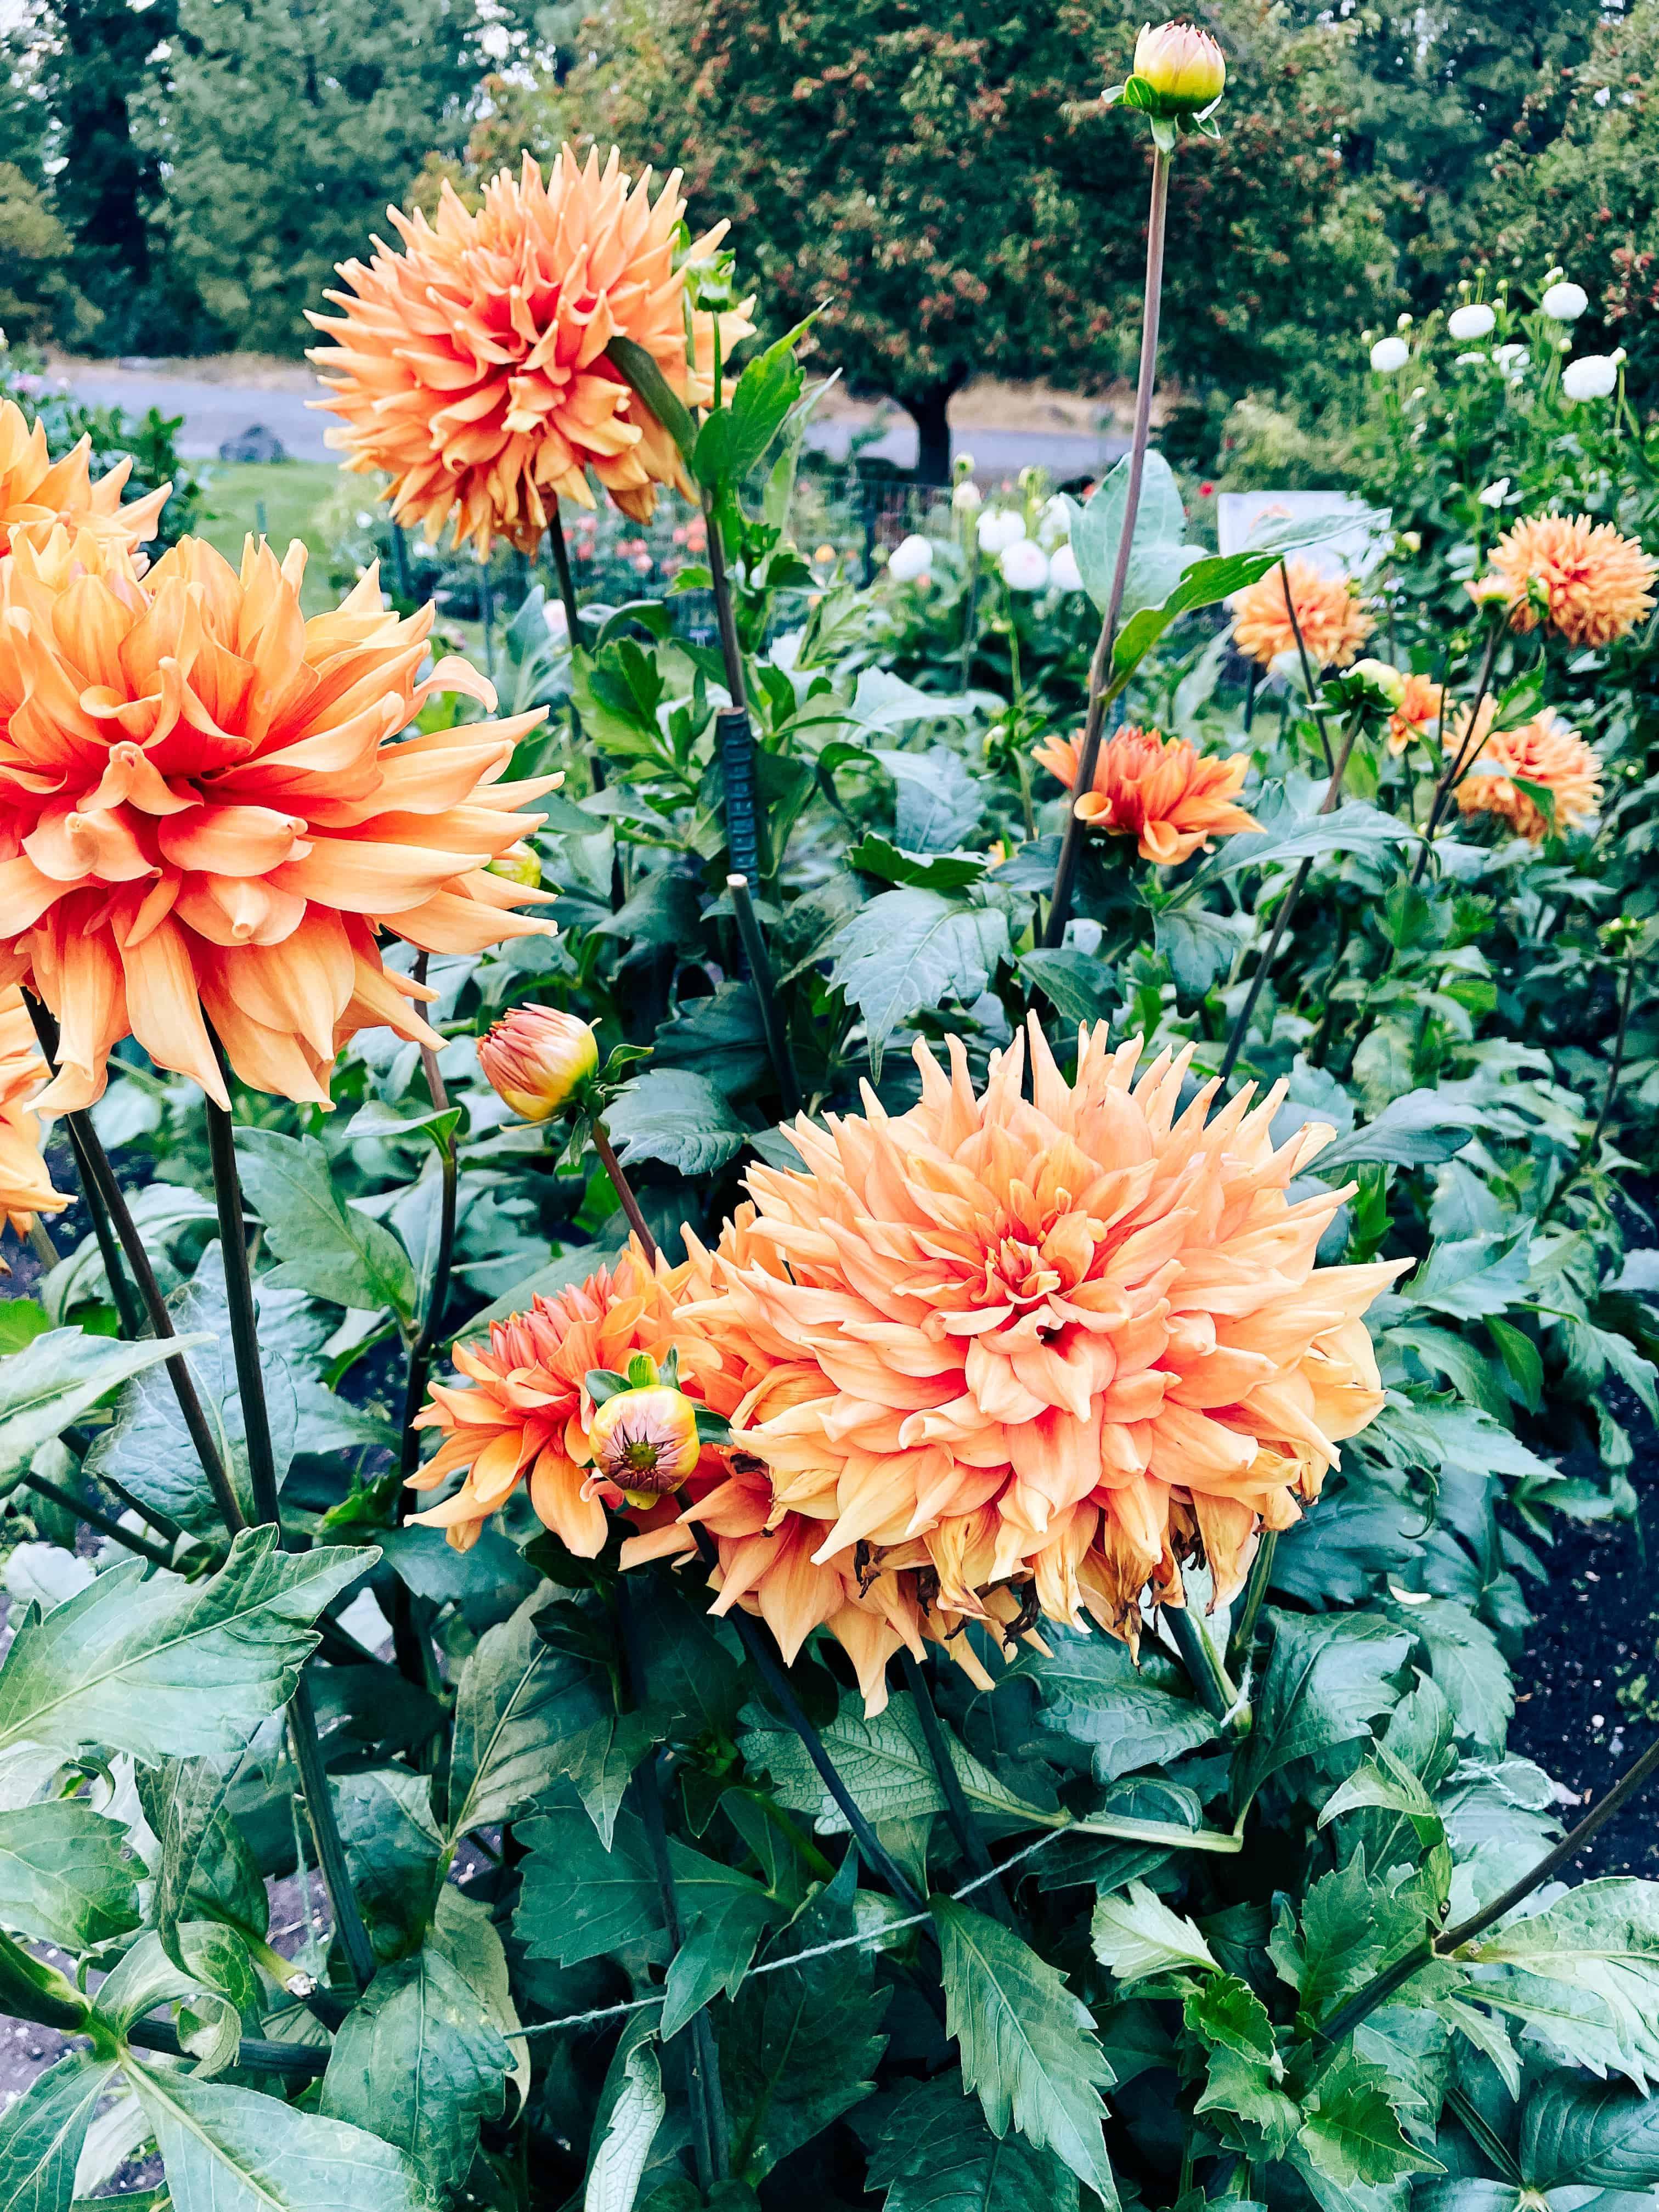 Rose Garden and Dahlias at Manito Park